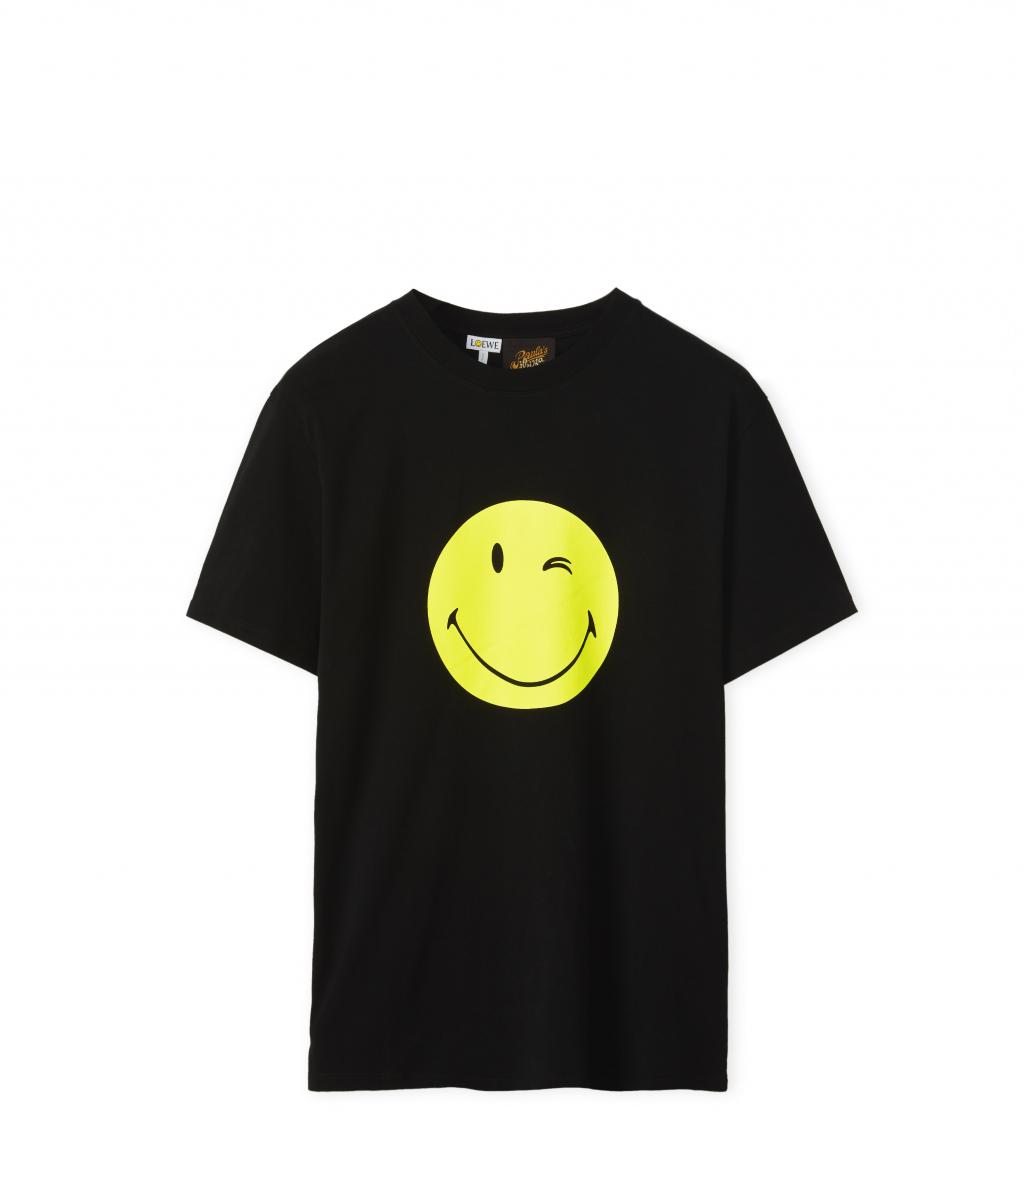 SMILEY T-SHIRT JAPAN ¥31,000 ※日本限定/ロエベ ジャパン クライアントサービス LOEWEPaula's 2020 featuring SmileyWorld®